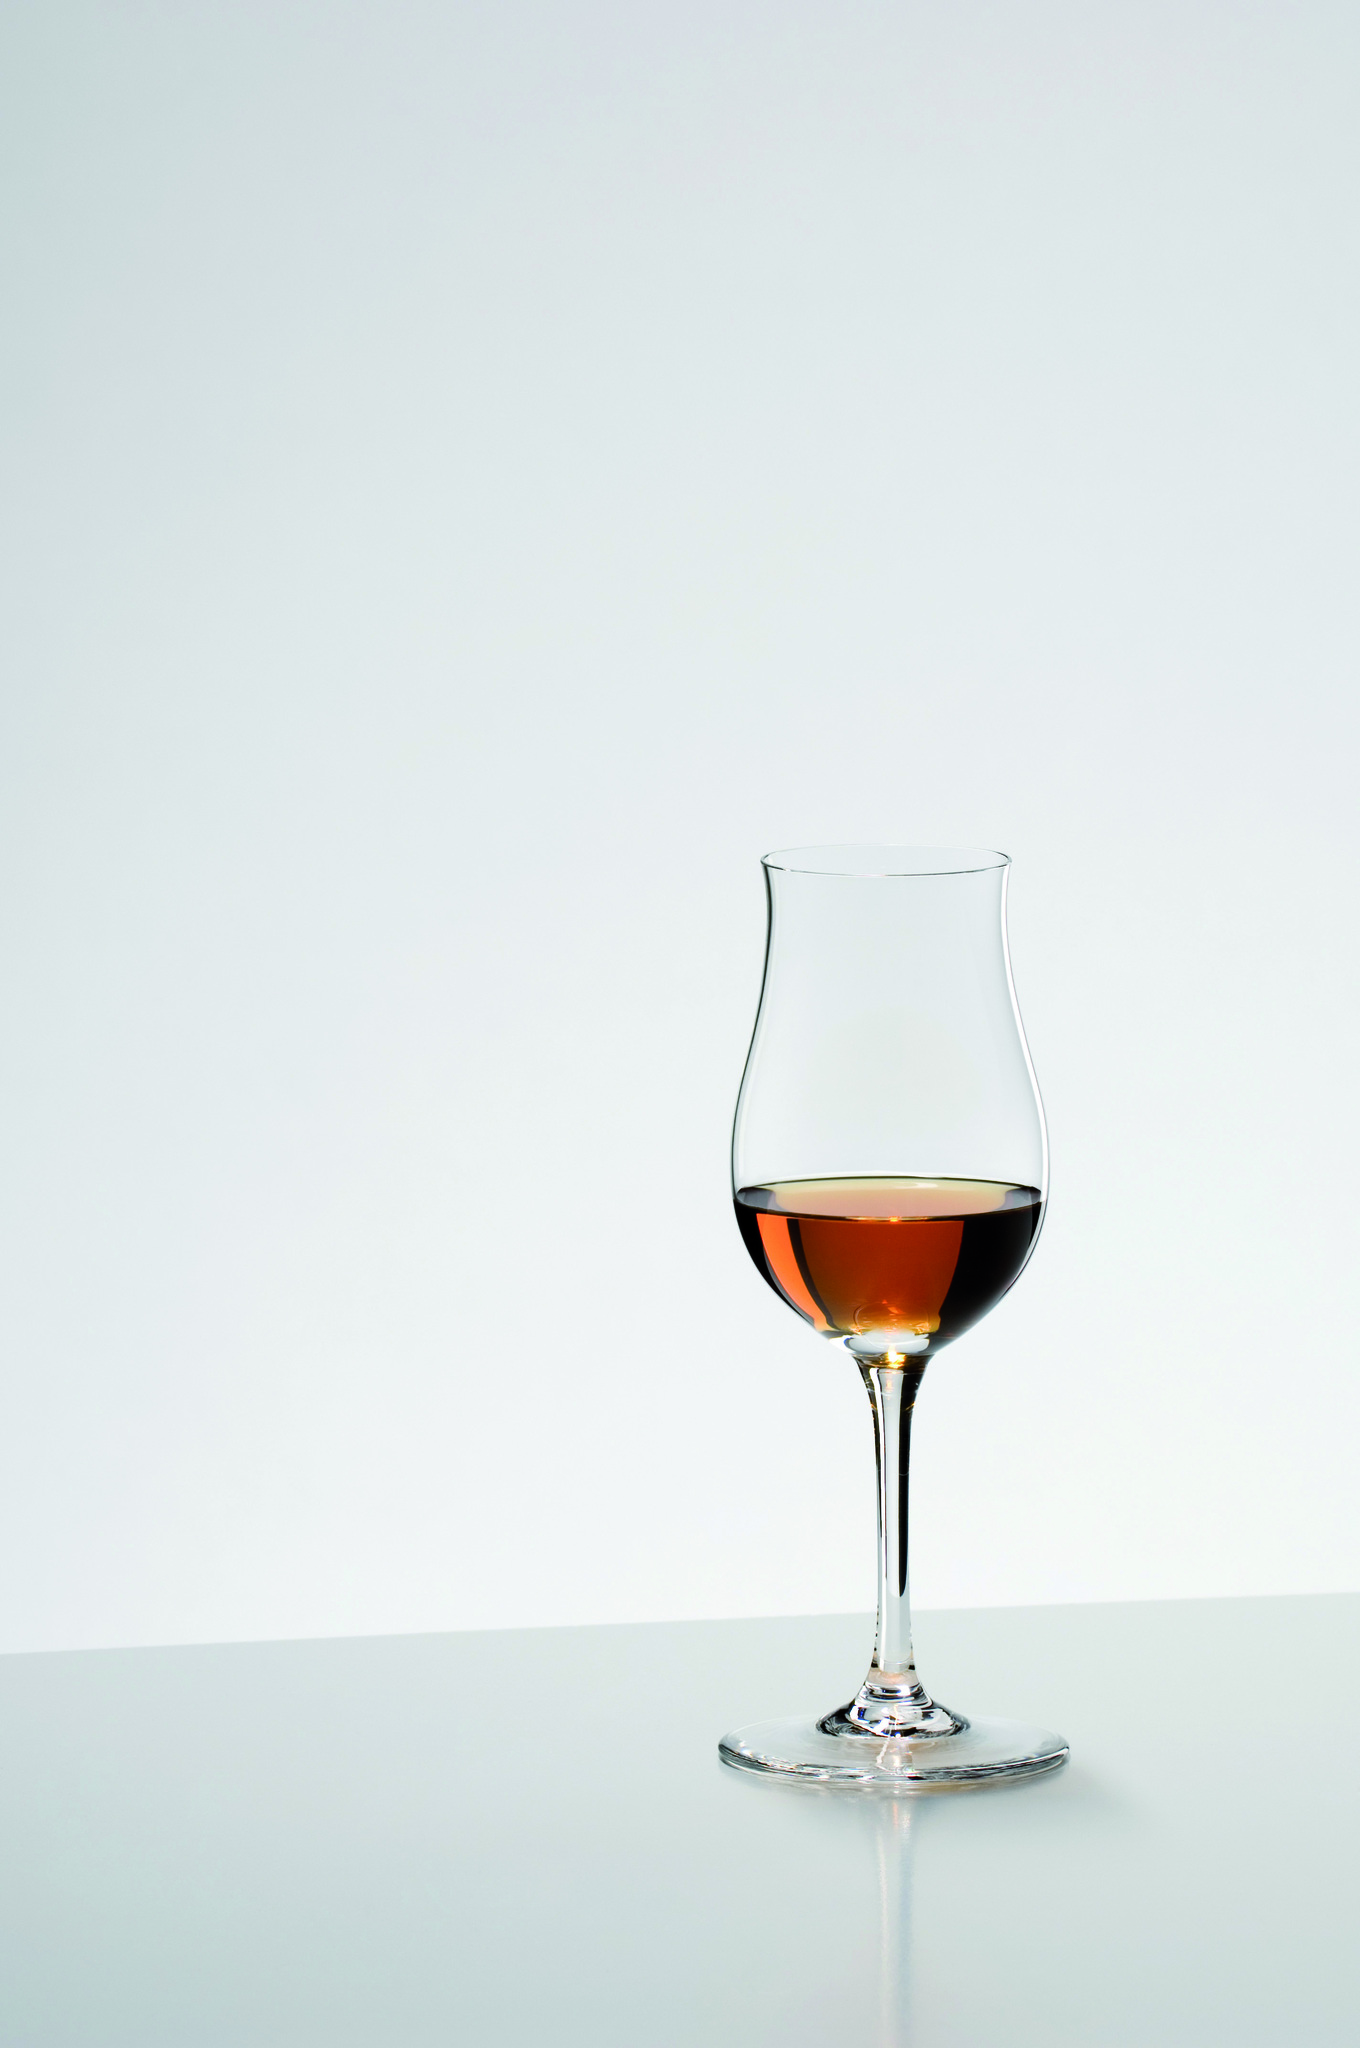 Бокал для коньяка 160мл Riedel Sommeliers Destillate Cognac VSOP